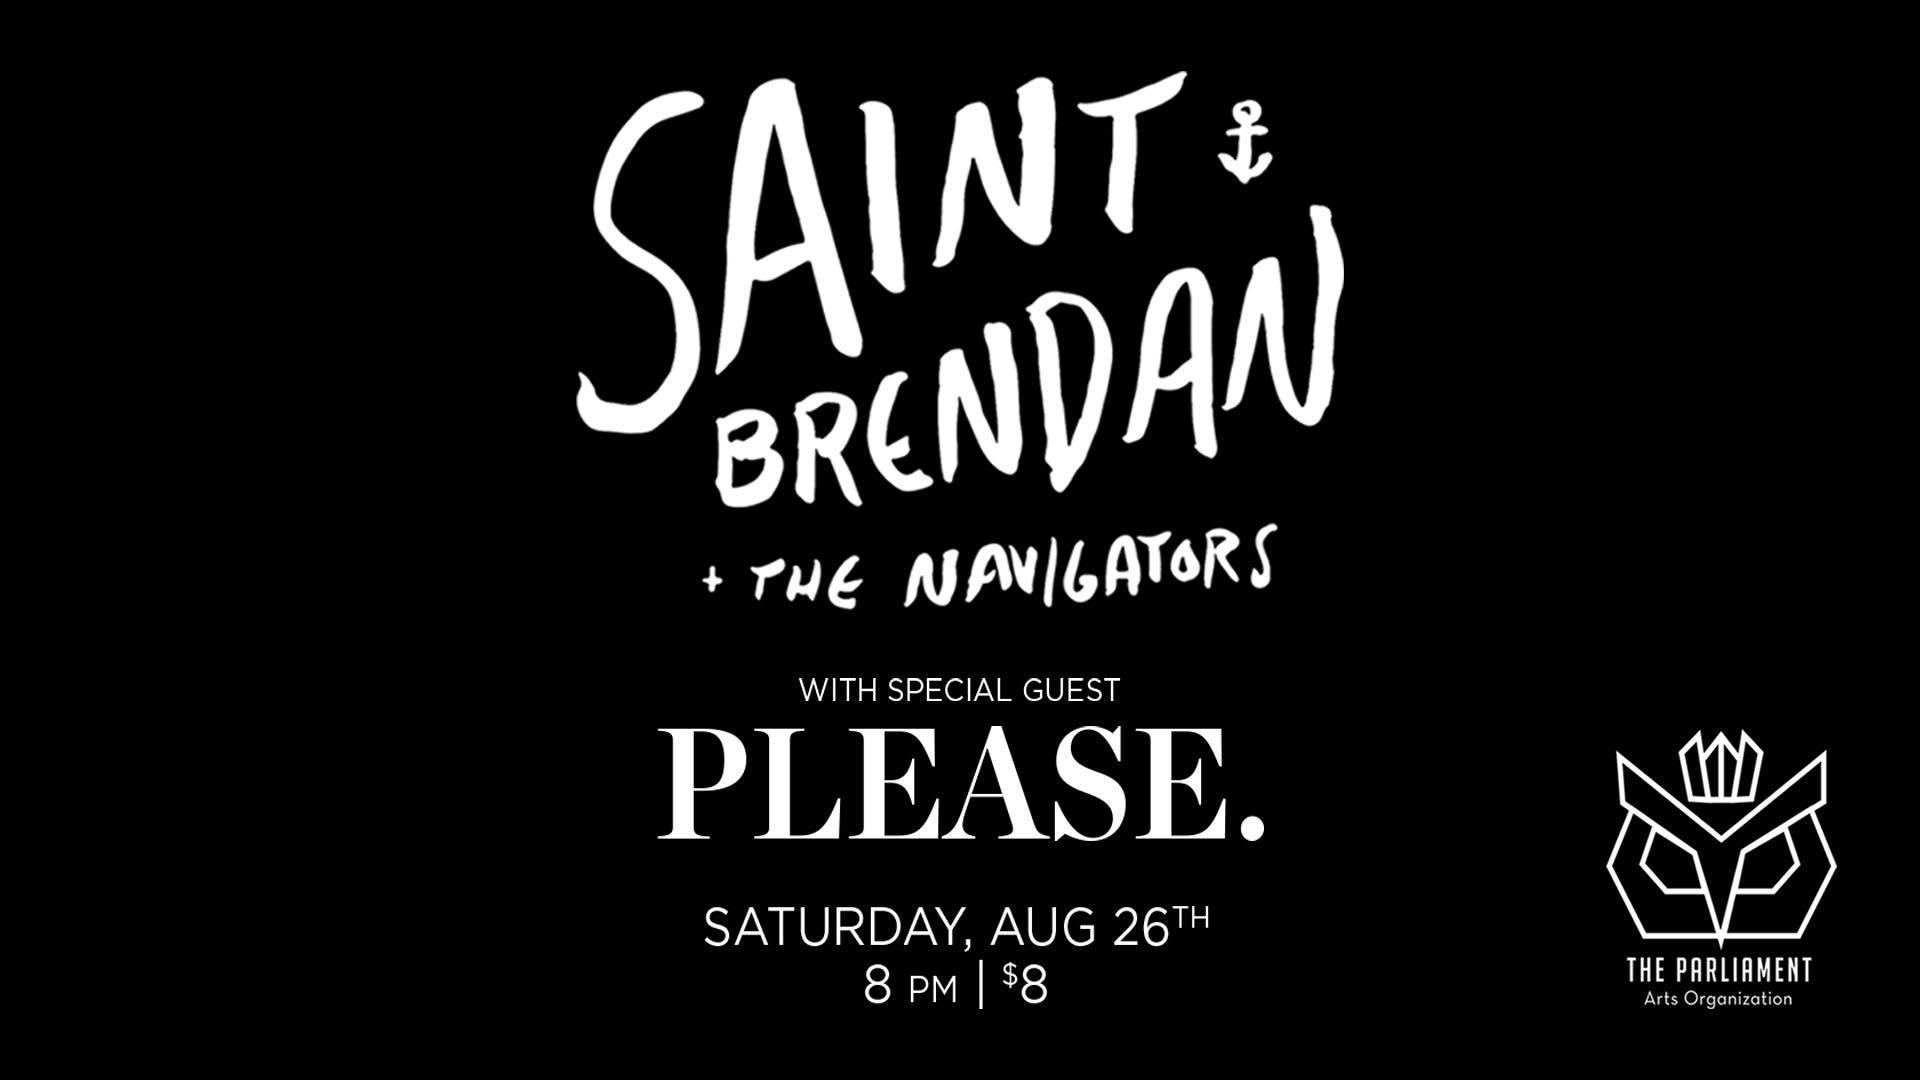 Saint Brendan & The Navigators